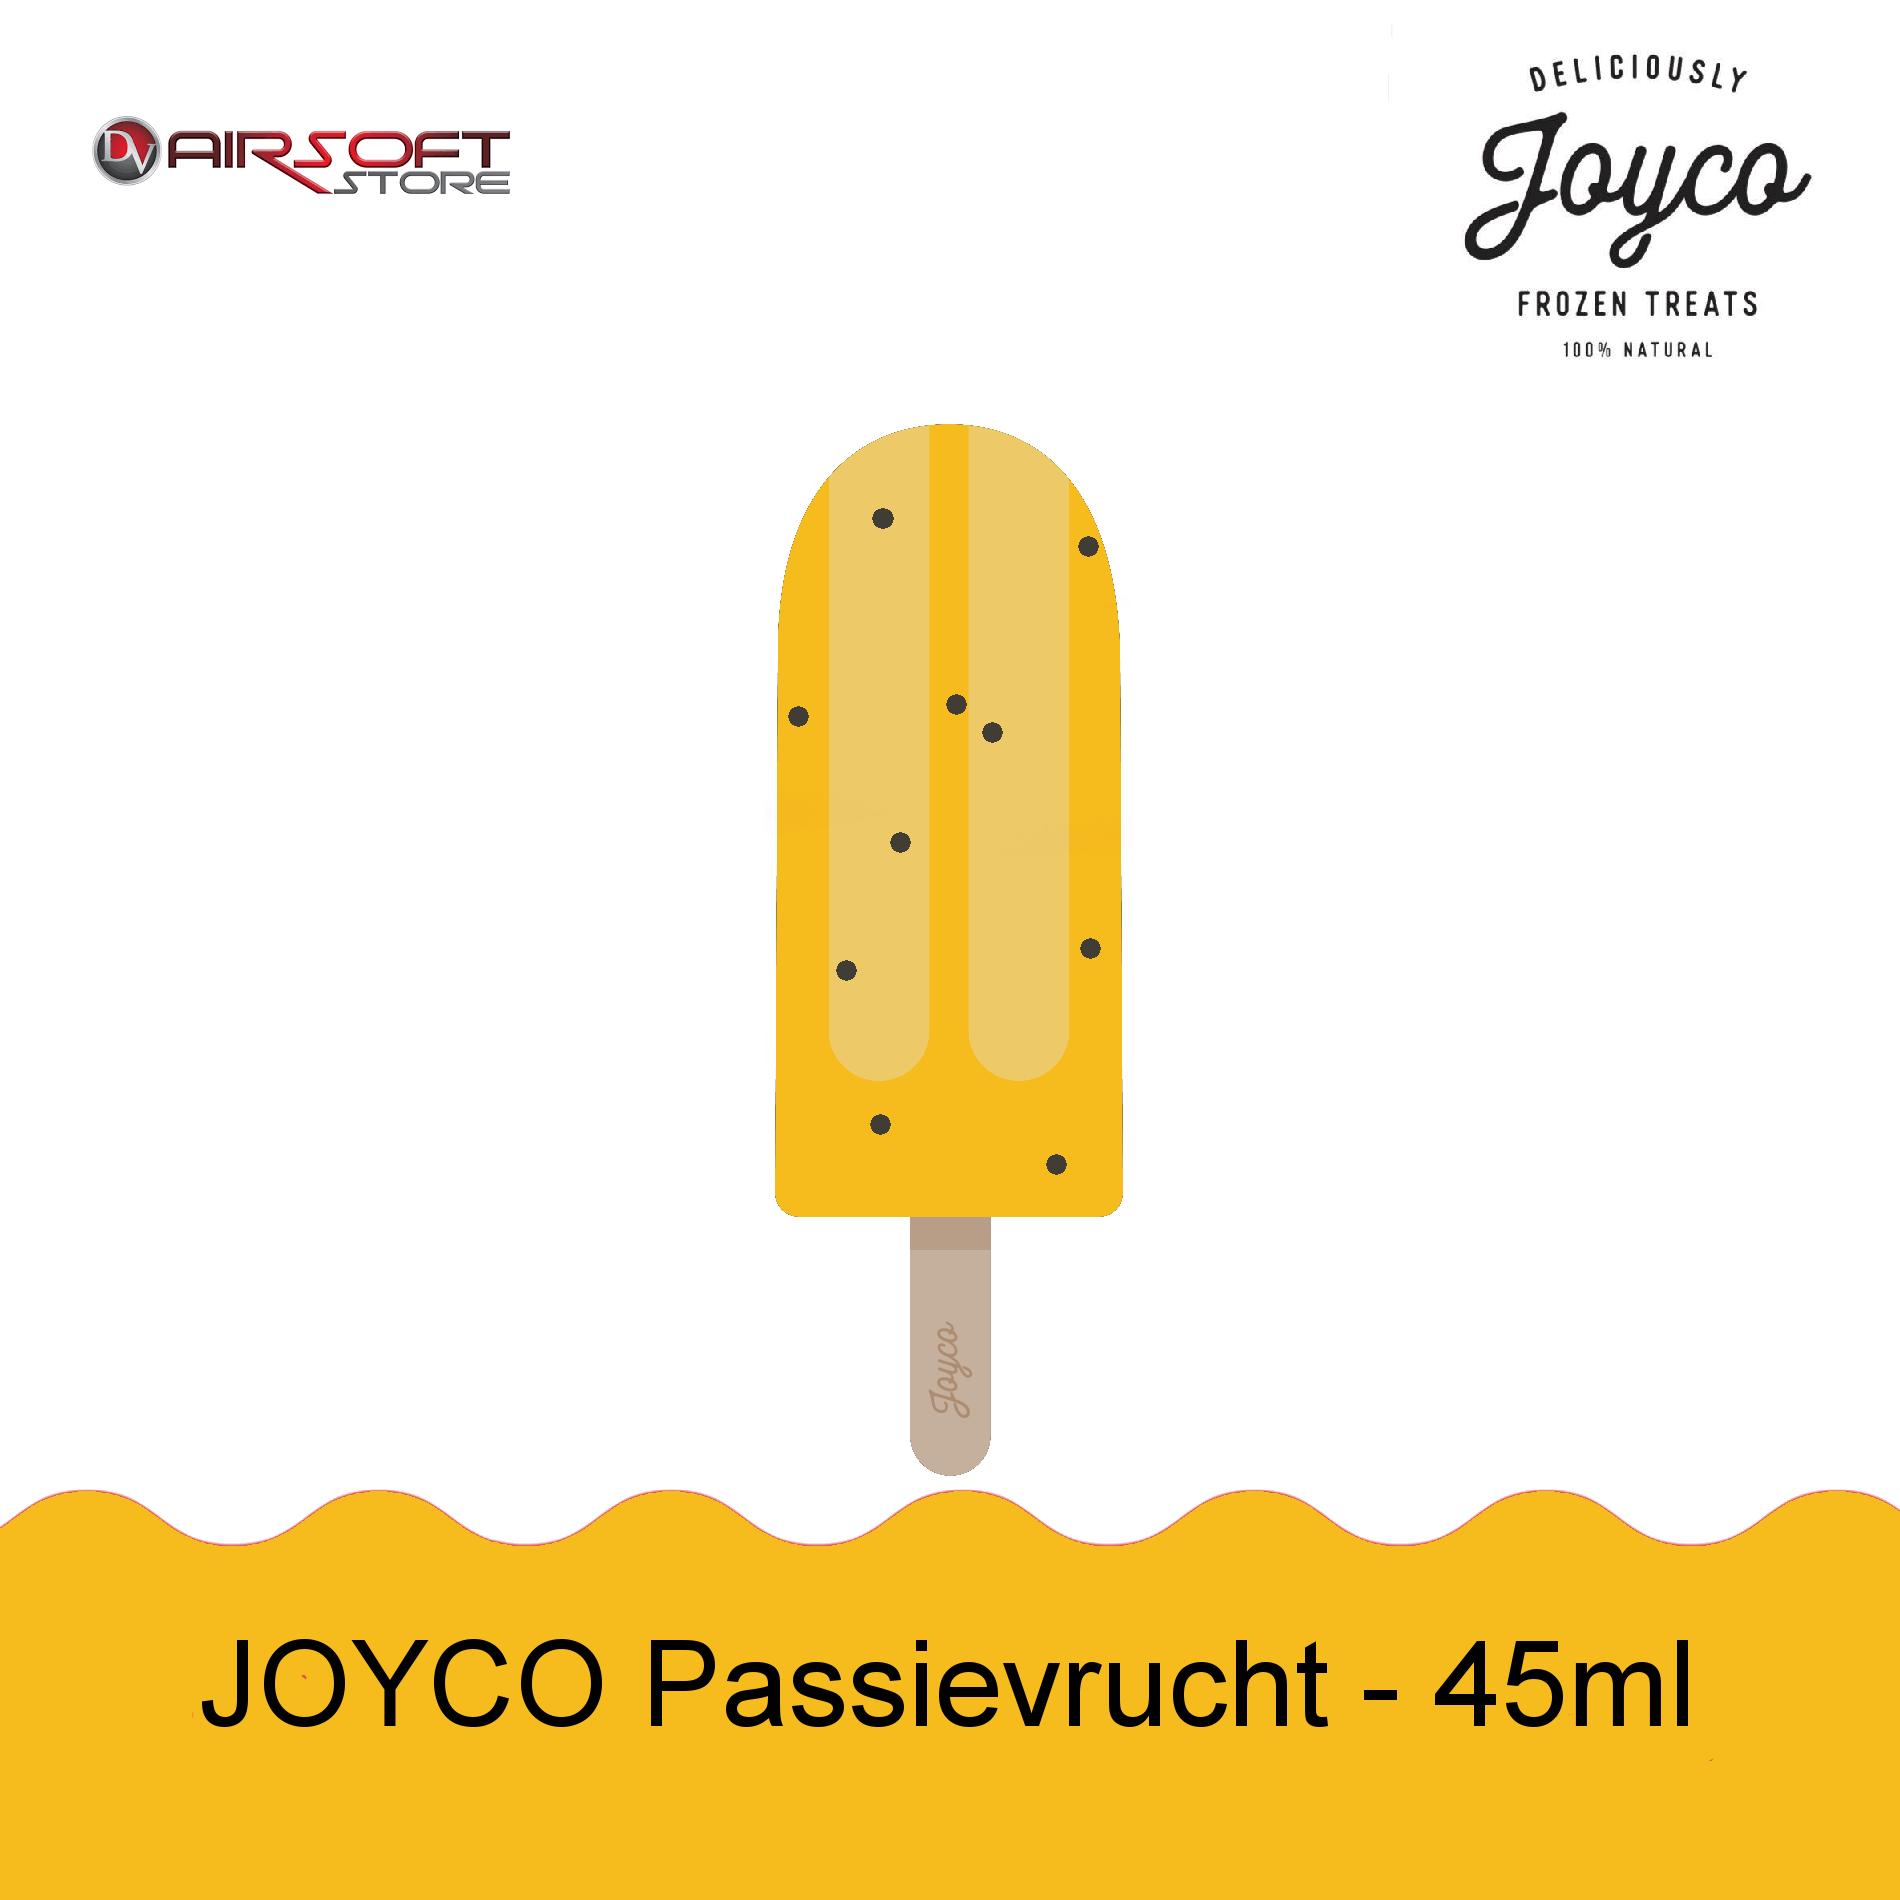 Joyco Joyco Passievrucht - 45ml